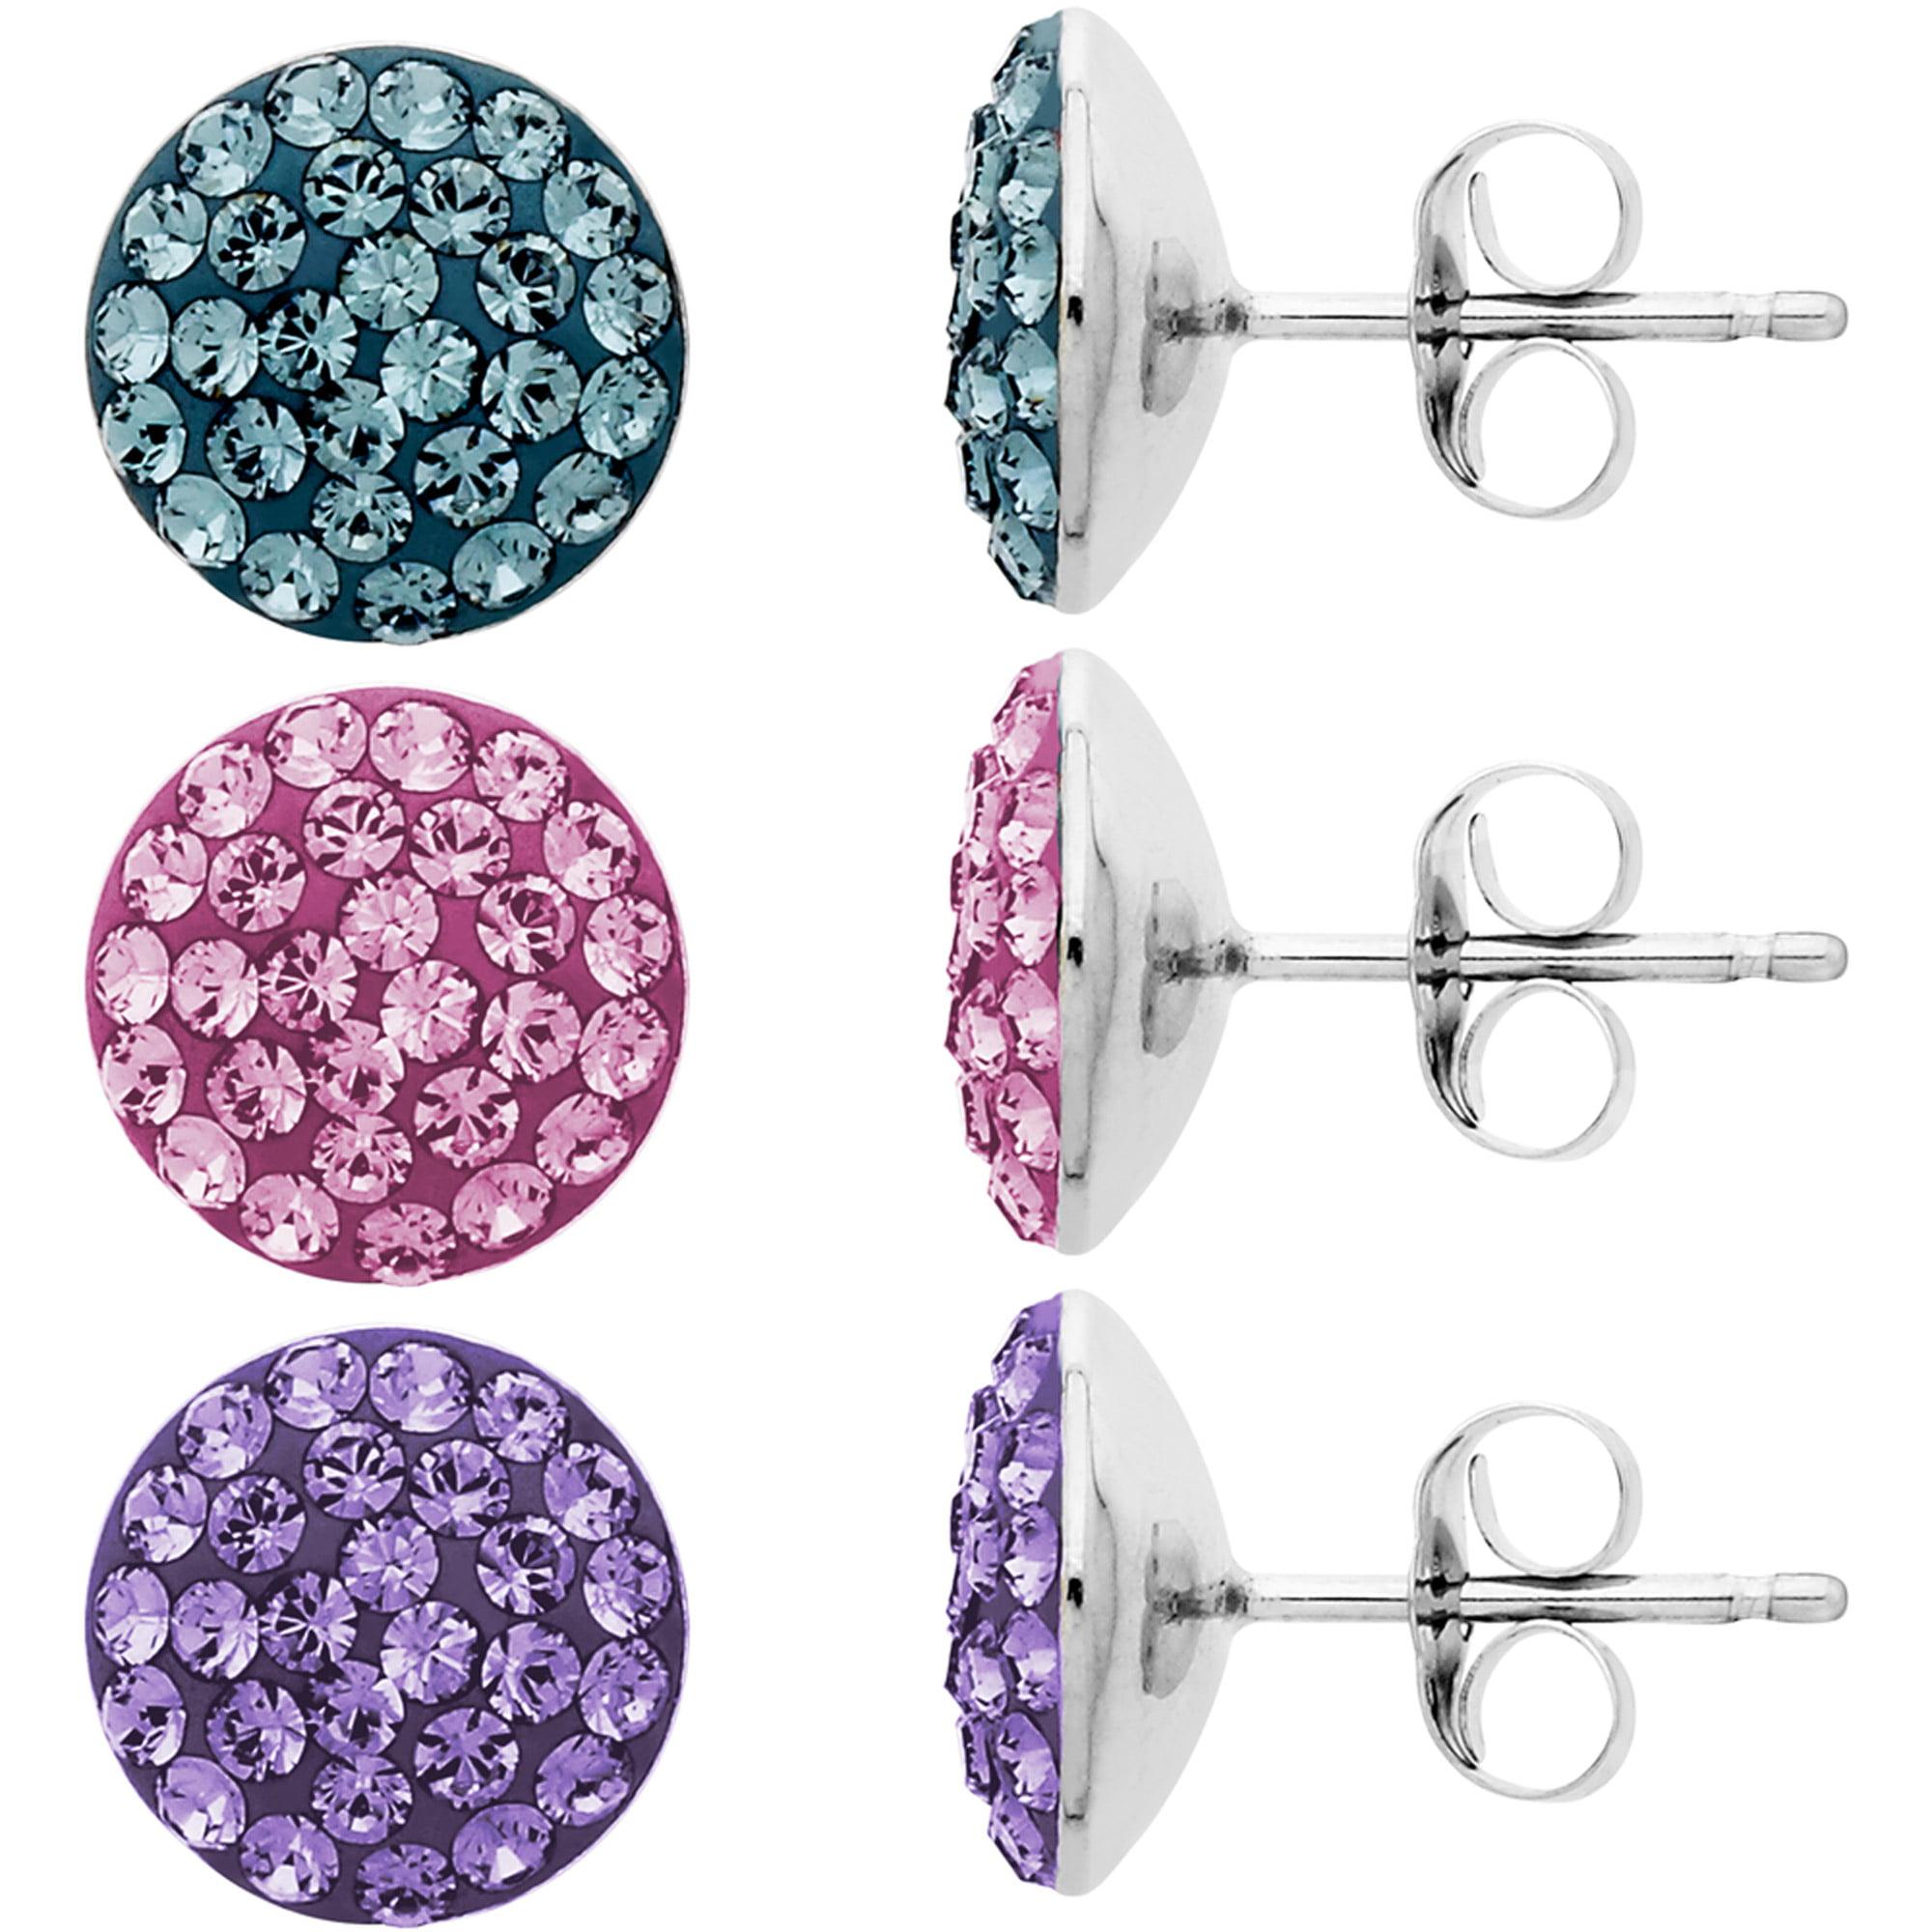 Luminesse Swarovski Element Sterling Silver 3-Piece Stud Earrings